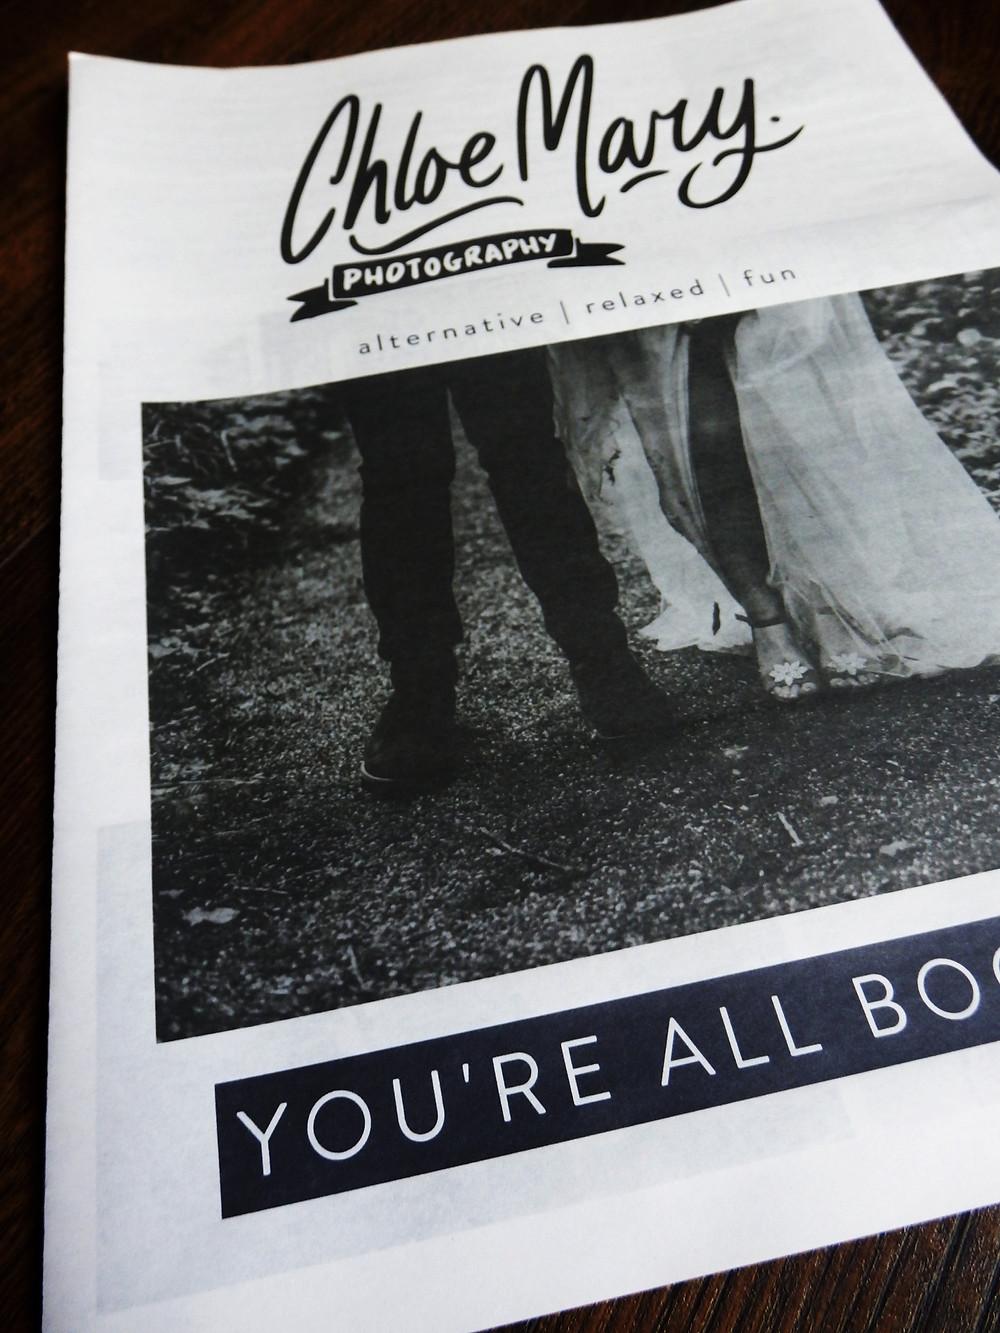 Chloe Mary Wedding Photography Marketing Newspaper